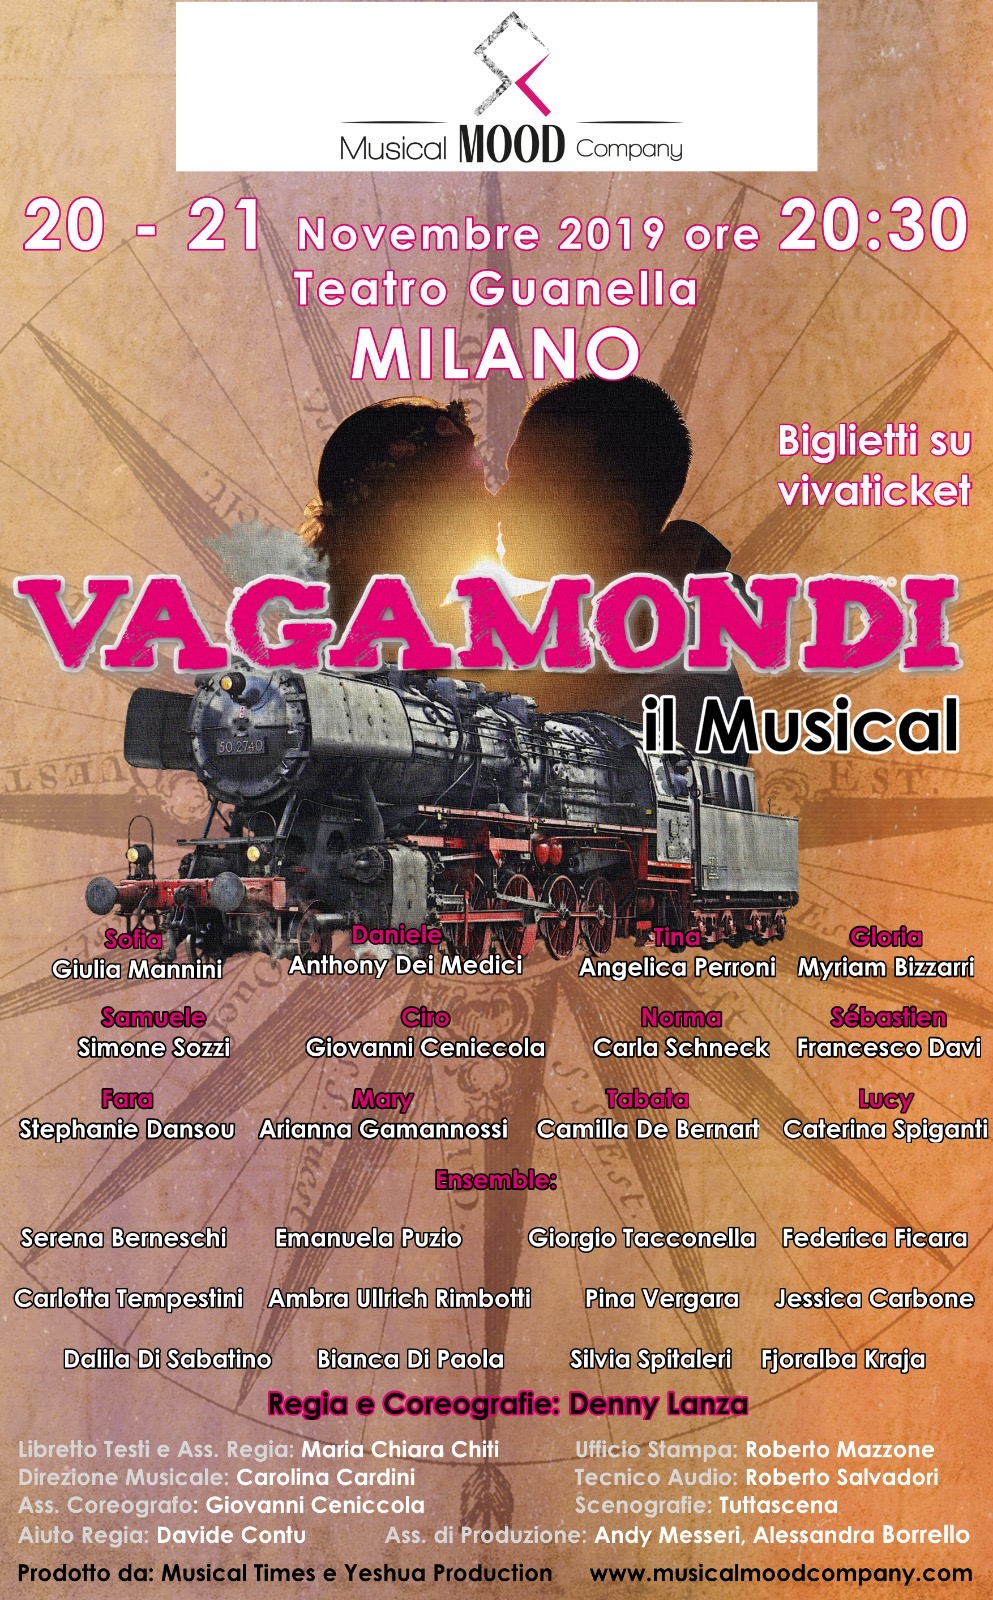 VAGAMONDI – IL MUSICAL